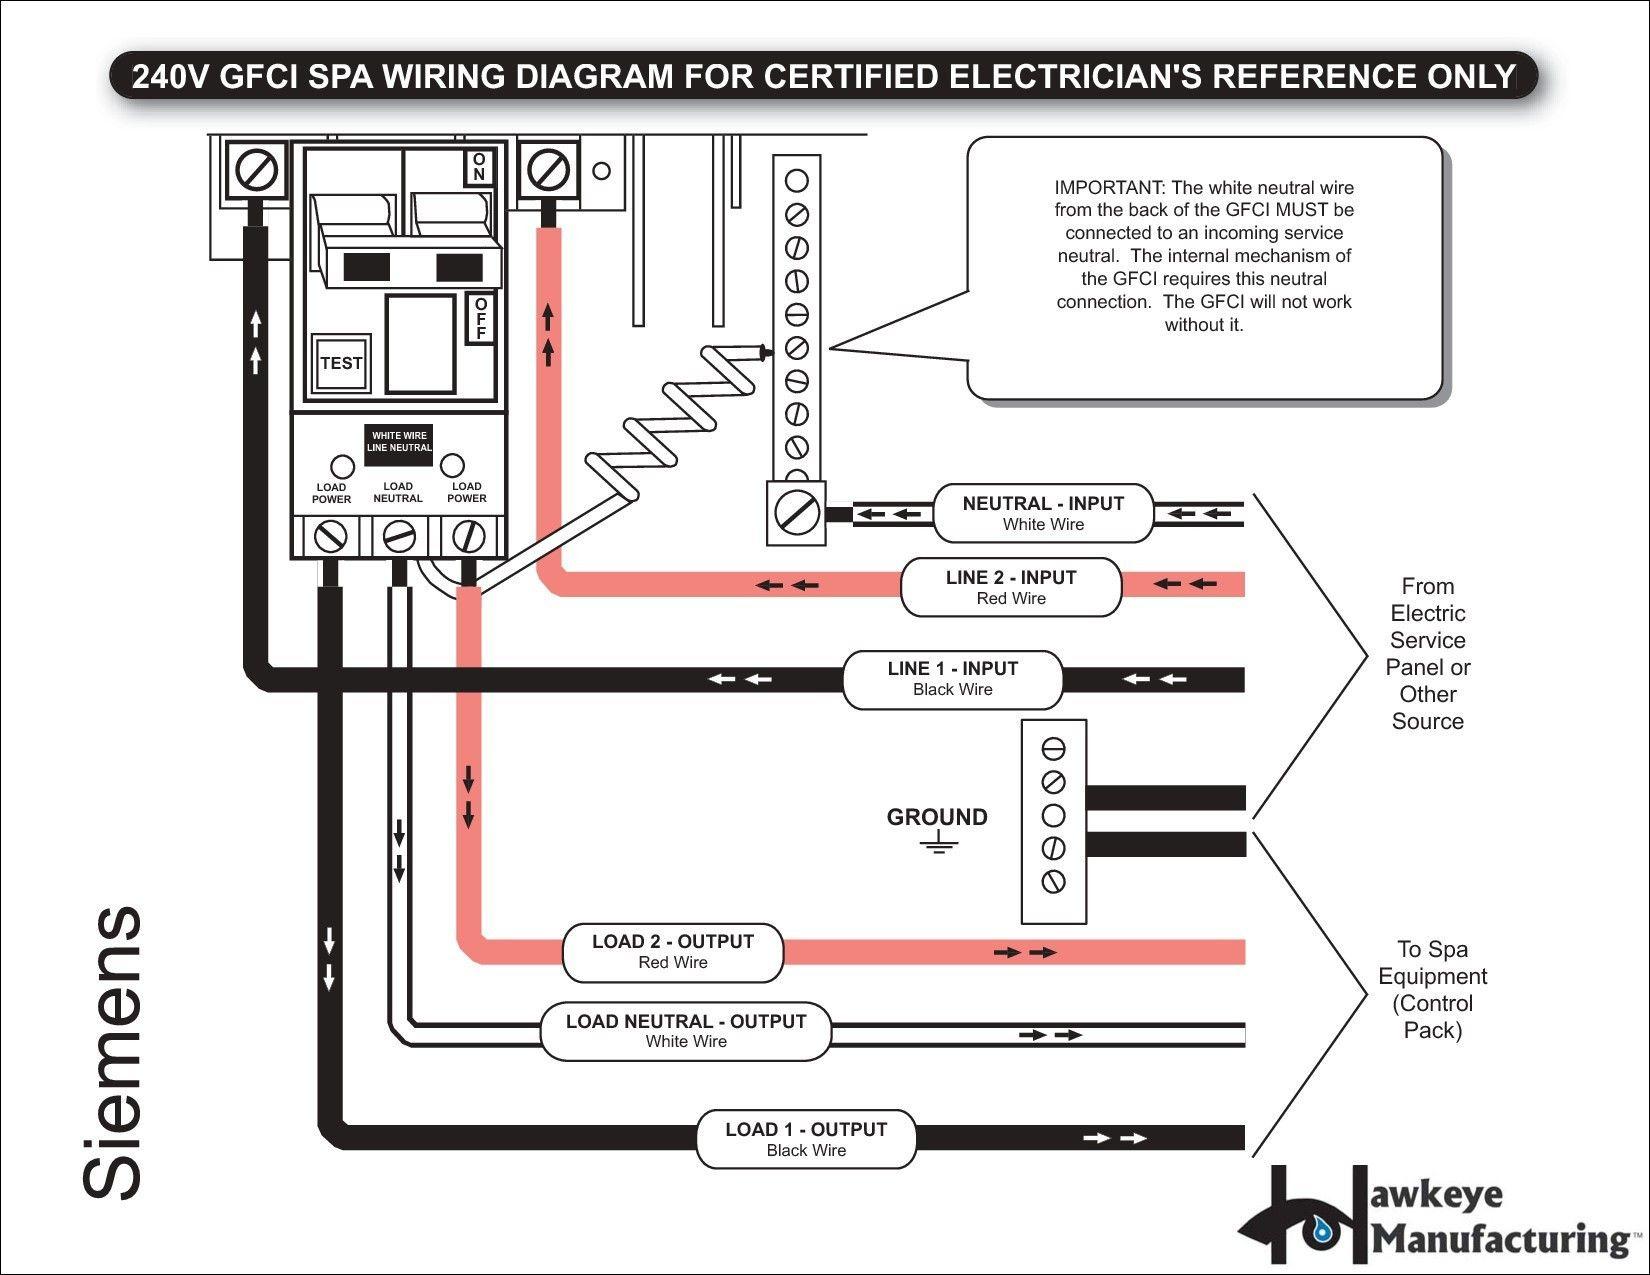 Gfci Breaker Wiring Diagram Awesome in 2020 Diagram